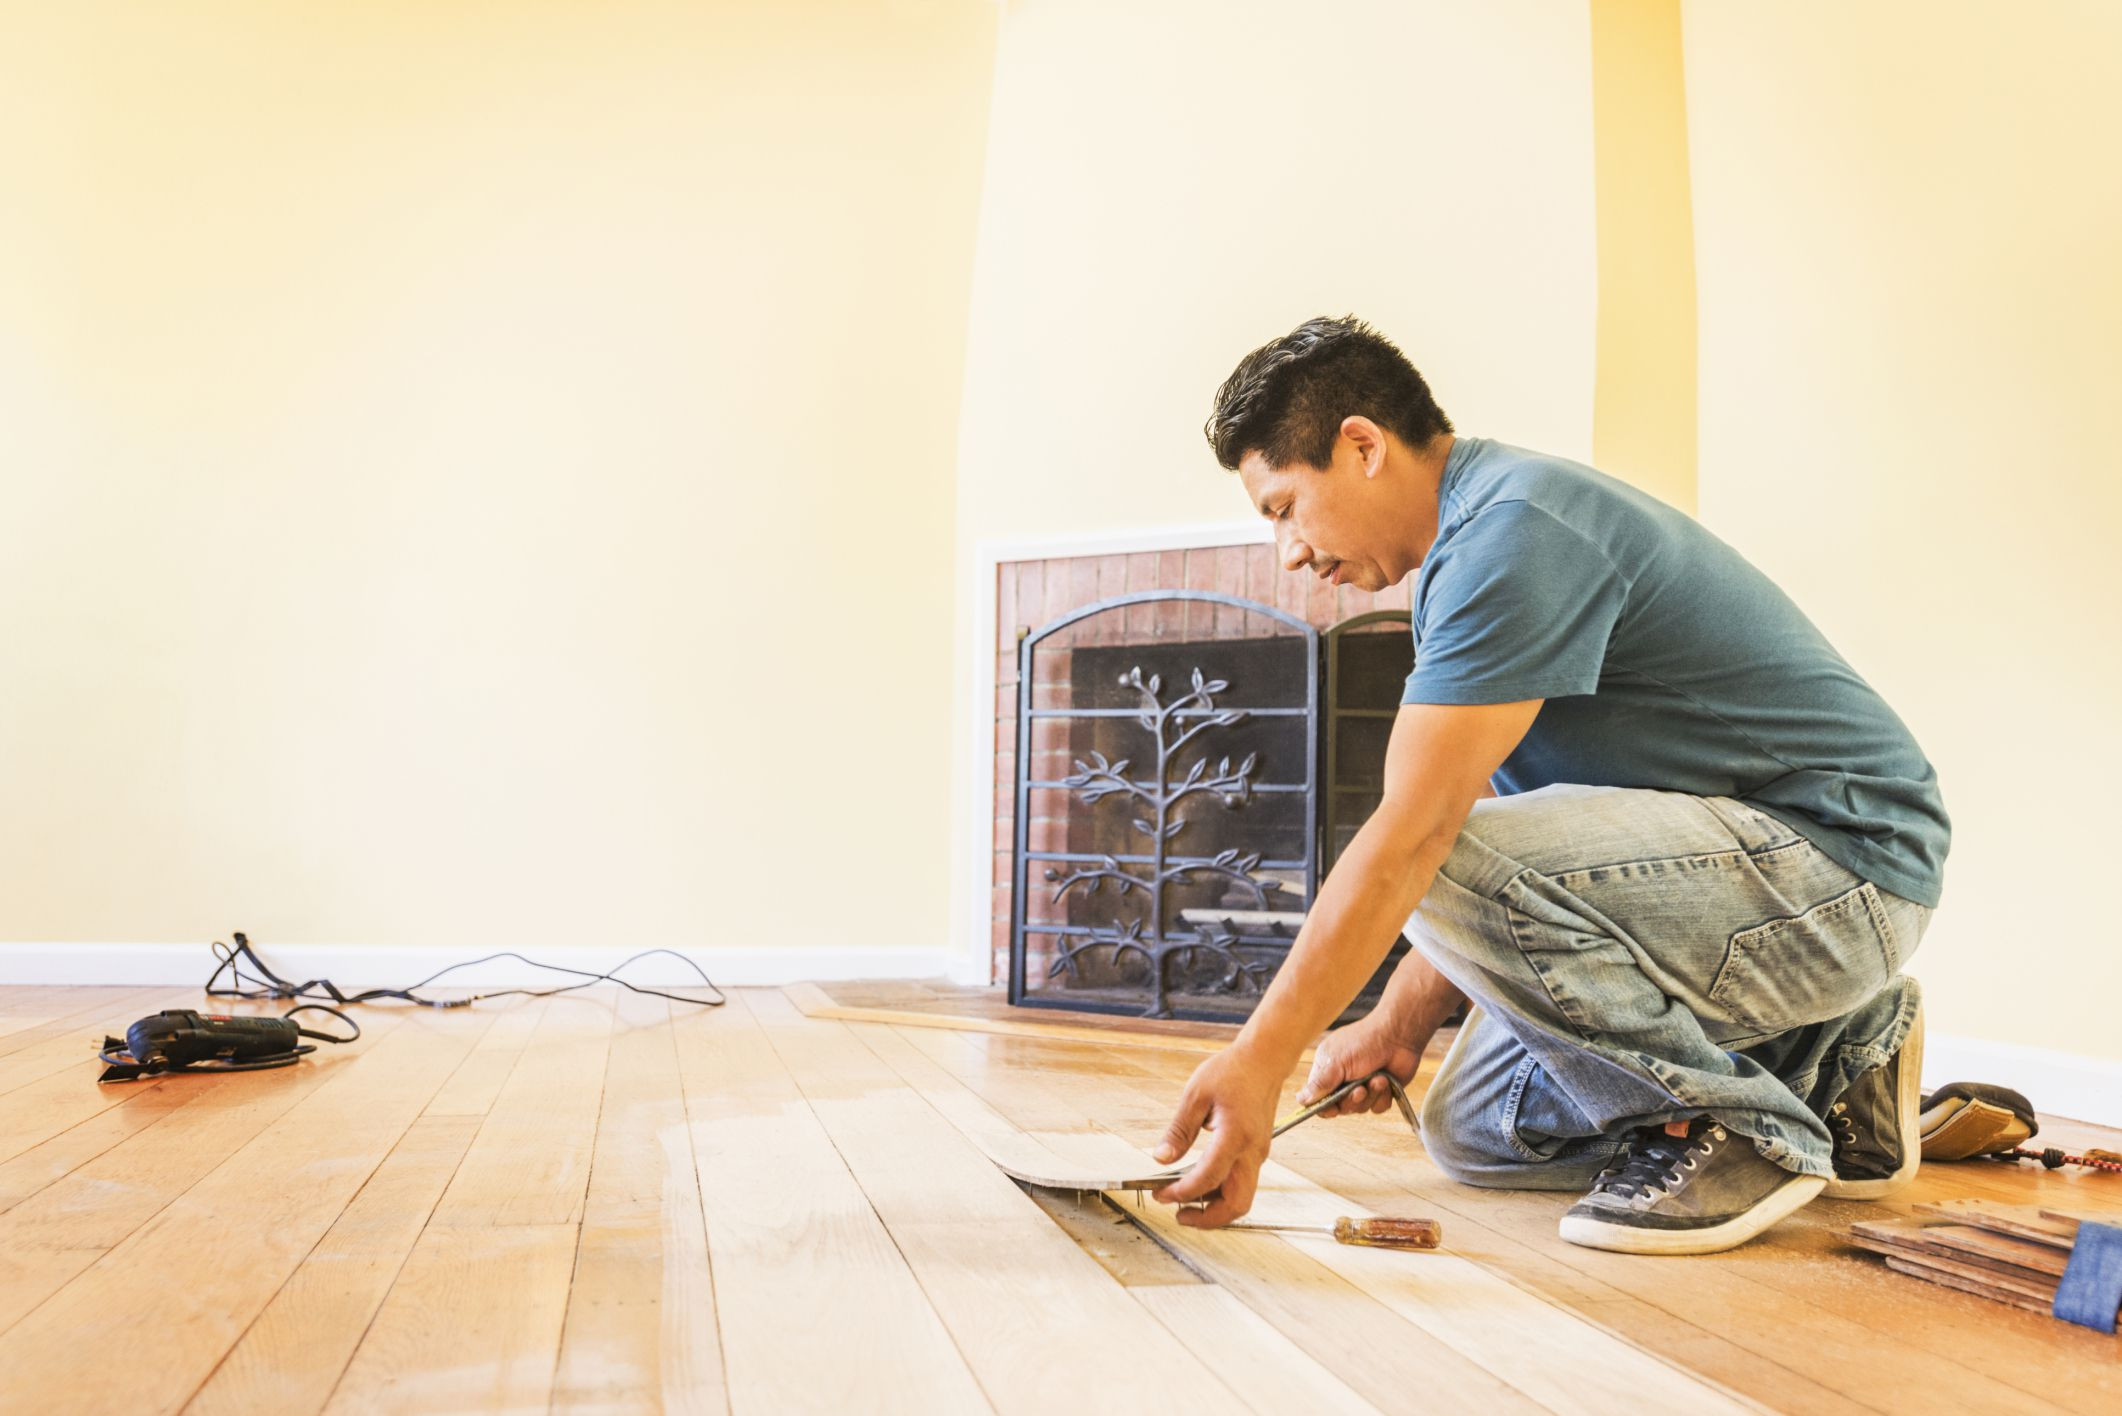 hardwood flooring installation guidelines of solid hardwood flooring costs for professional vs diy regarding installwoodflooring 592016327 56684d6f3df78ce1610a598a